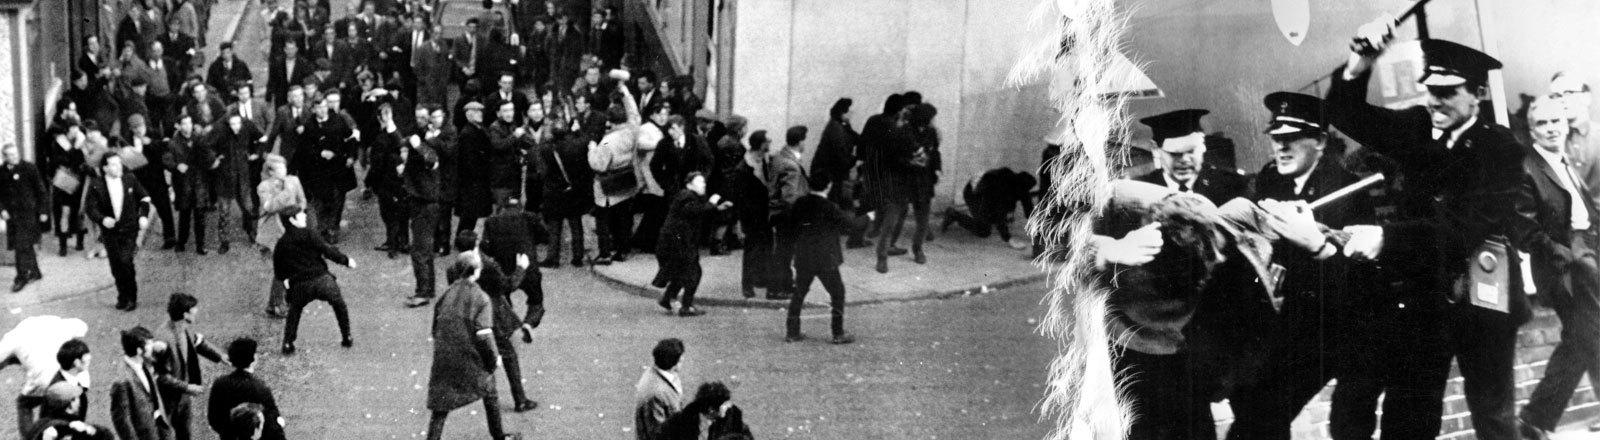 Protestmarsch Londonderry 5.10.1968